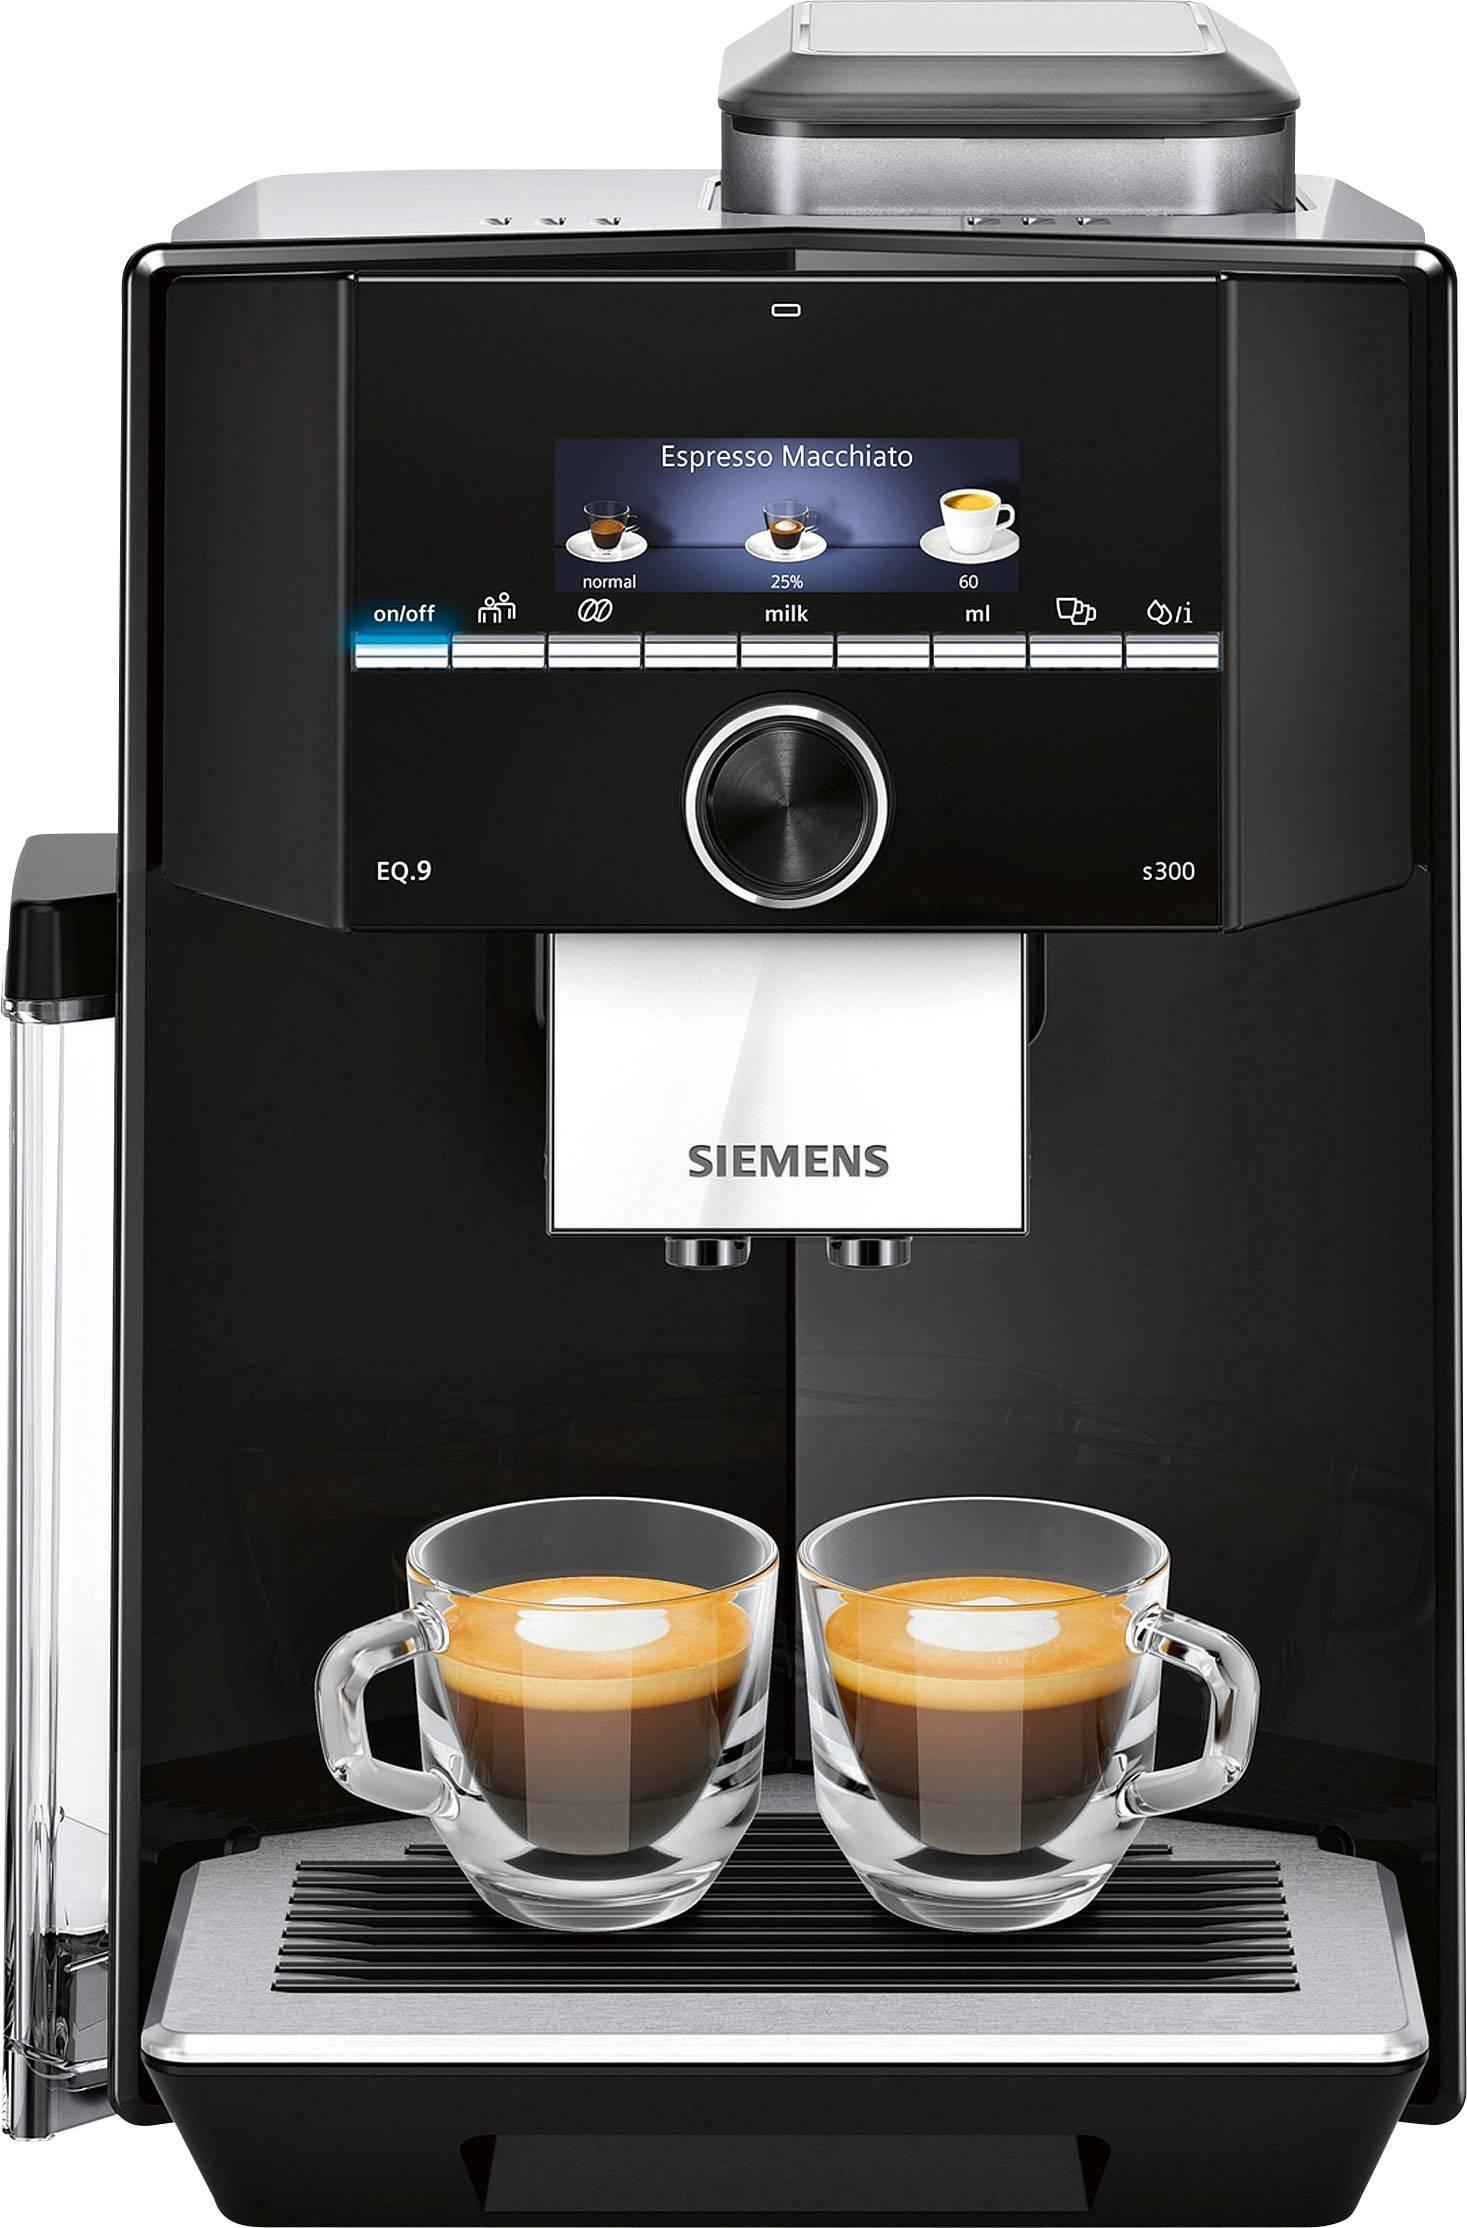 Lækker Fuldautomatisk kaffemaskine Siemens EQ9 S300 Sort QU-77